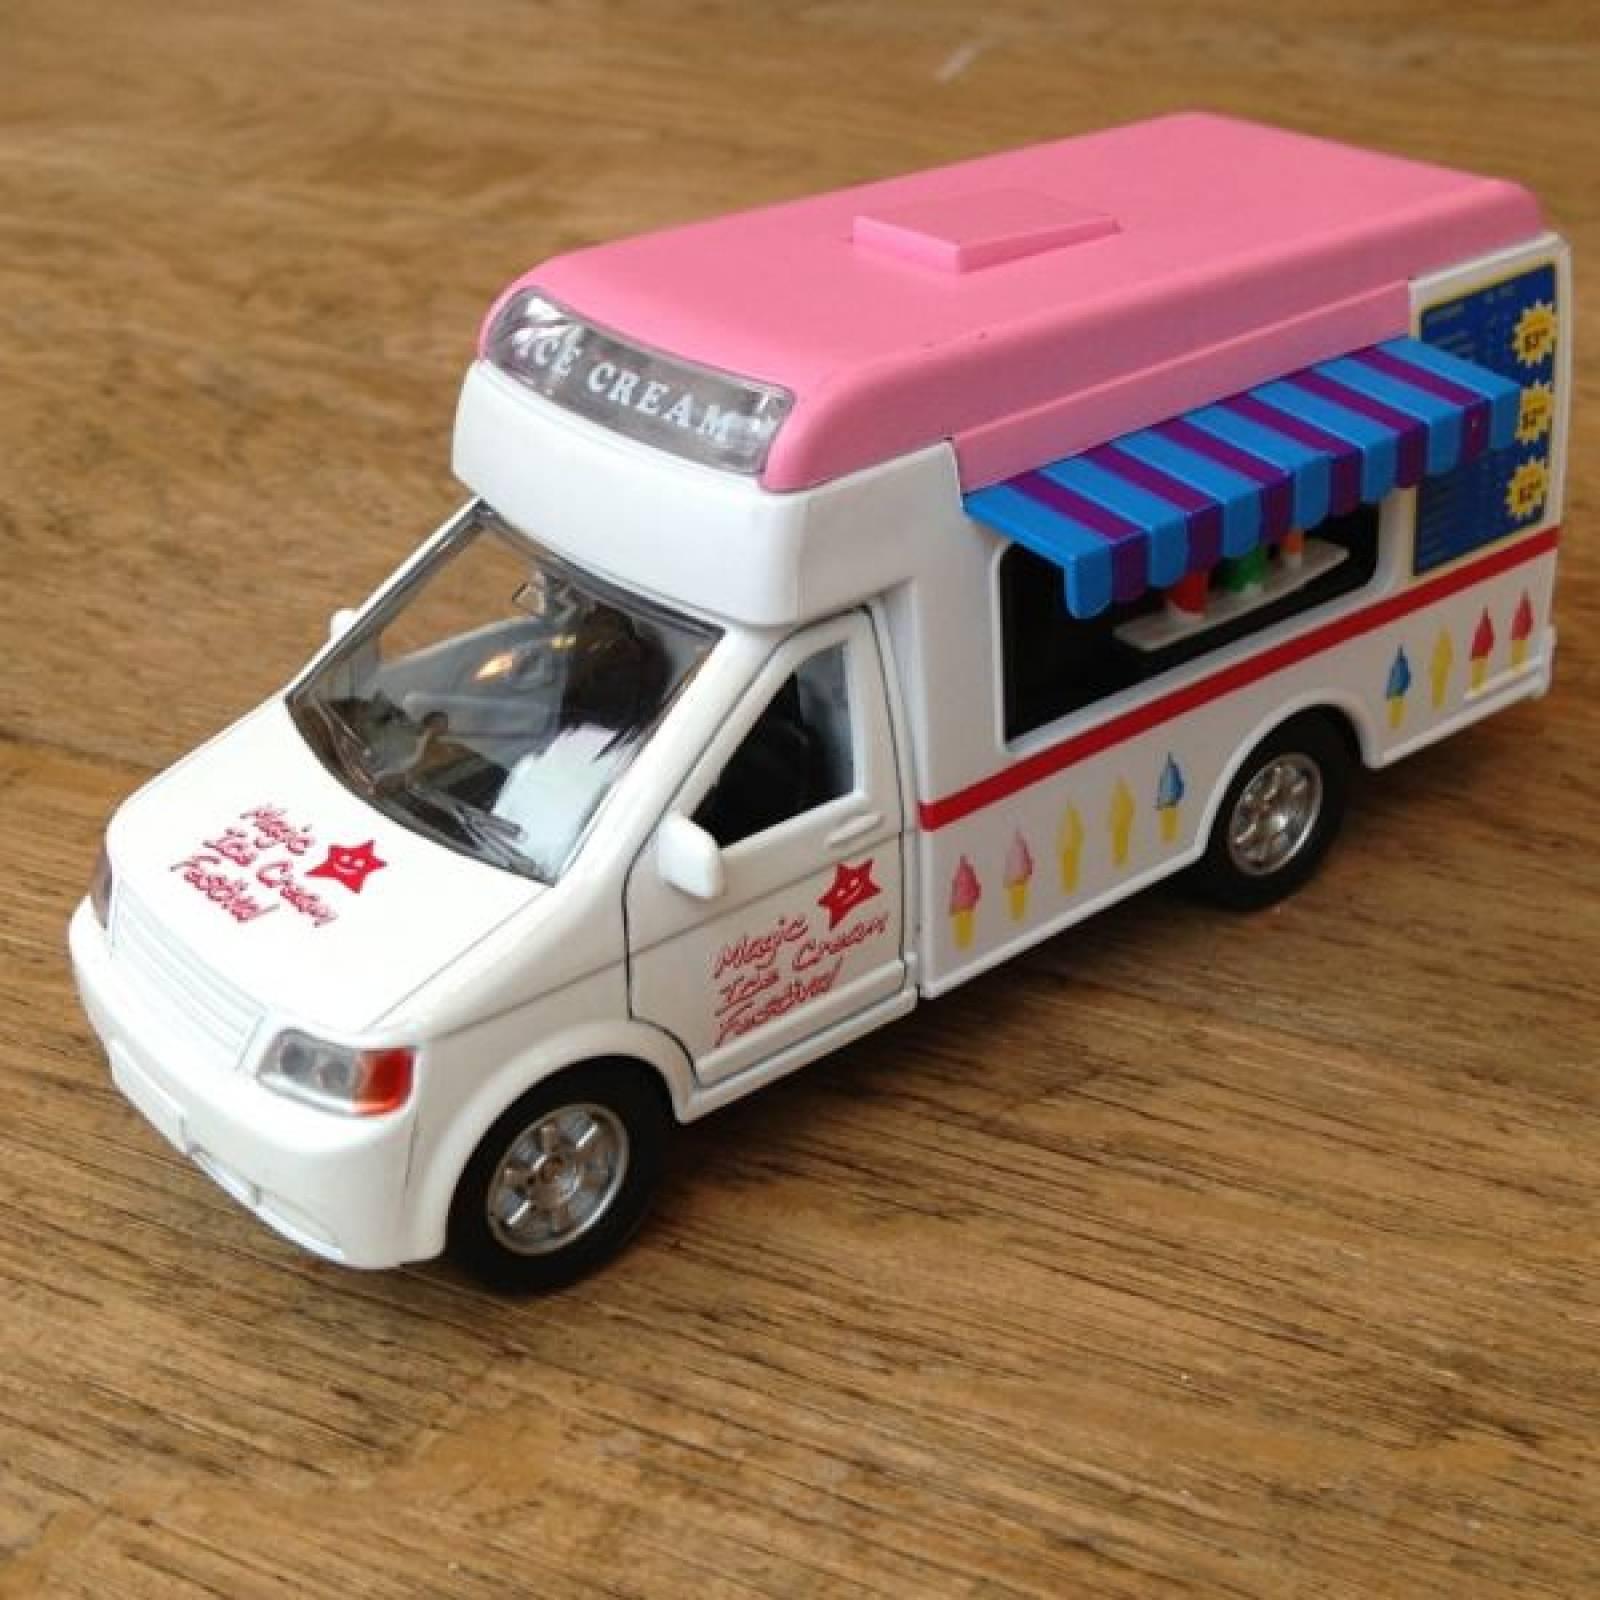 Teamsterz Ice Cream Van Toy Car thumbnails